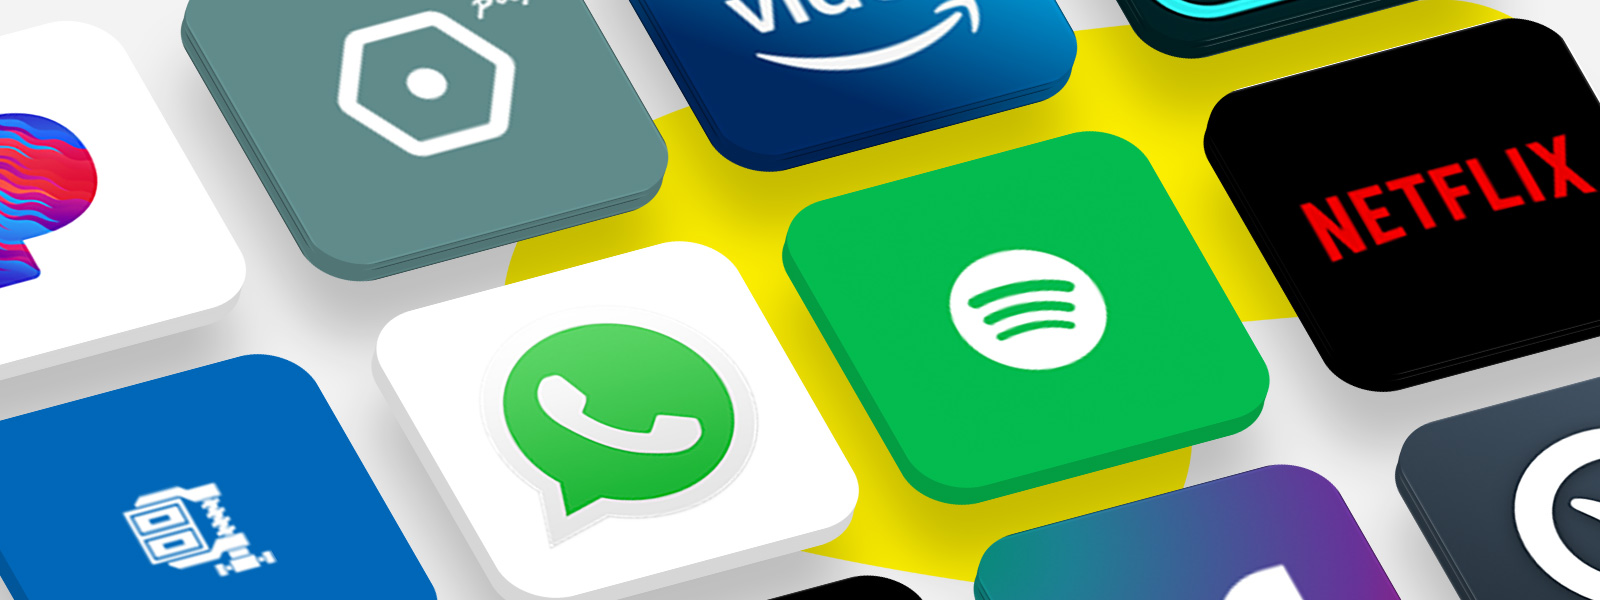 De nombreux logos d'applications populaires